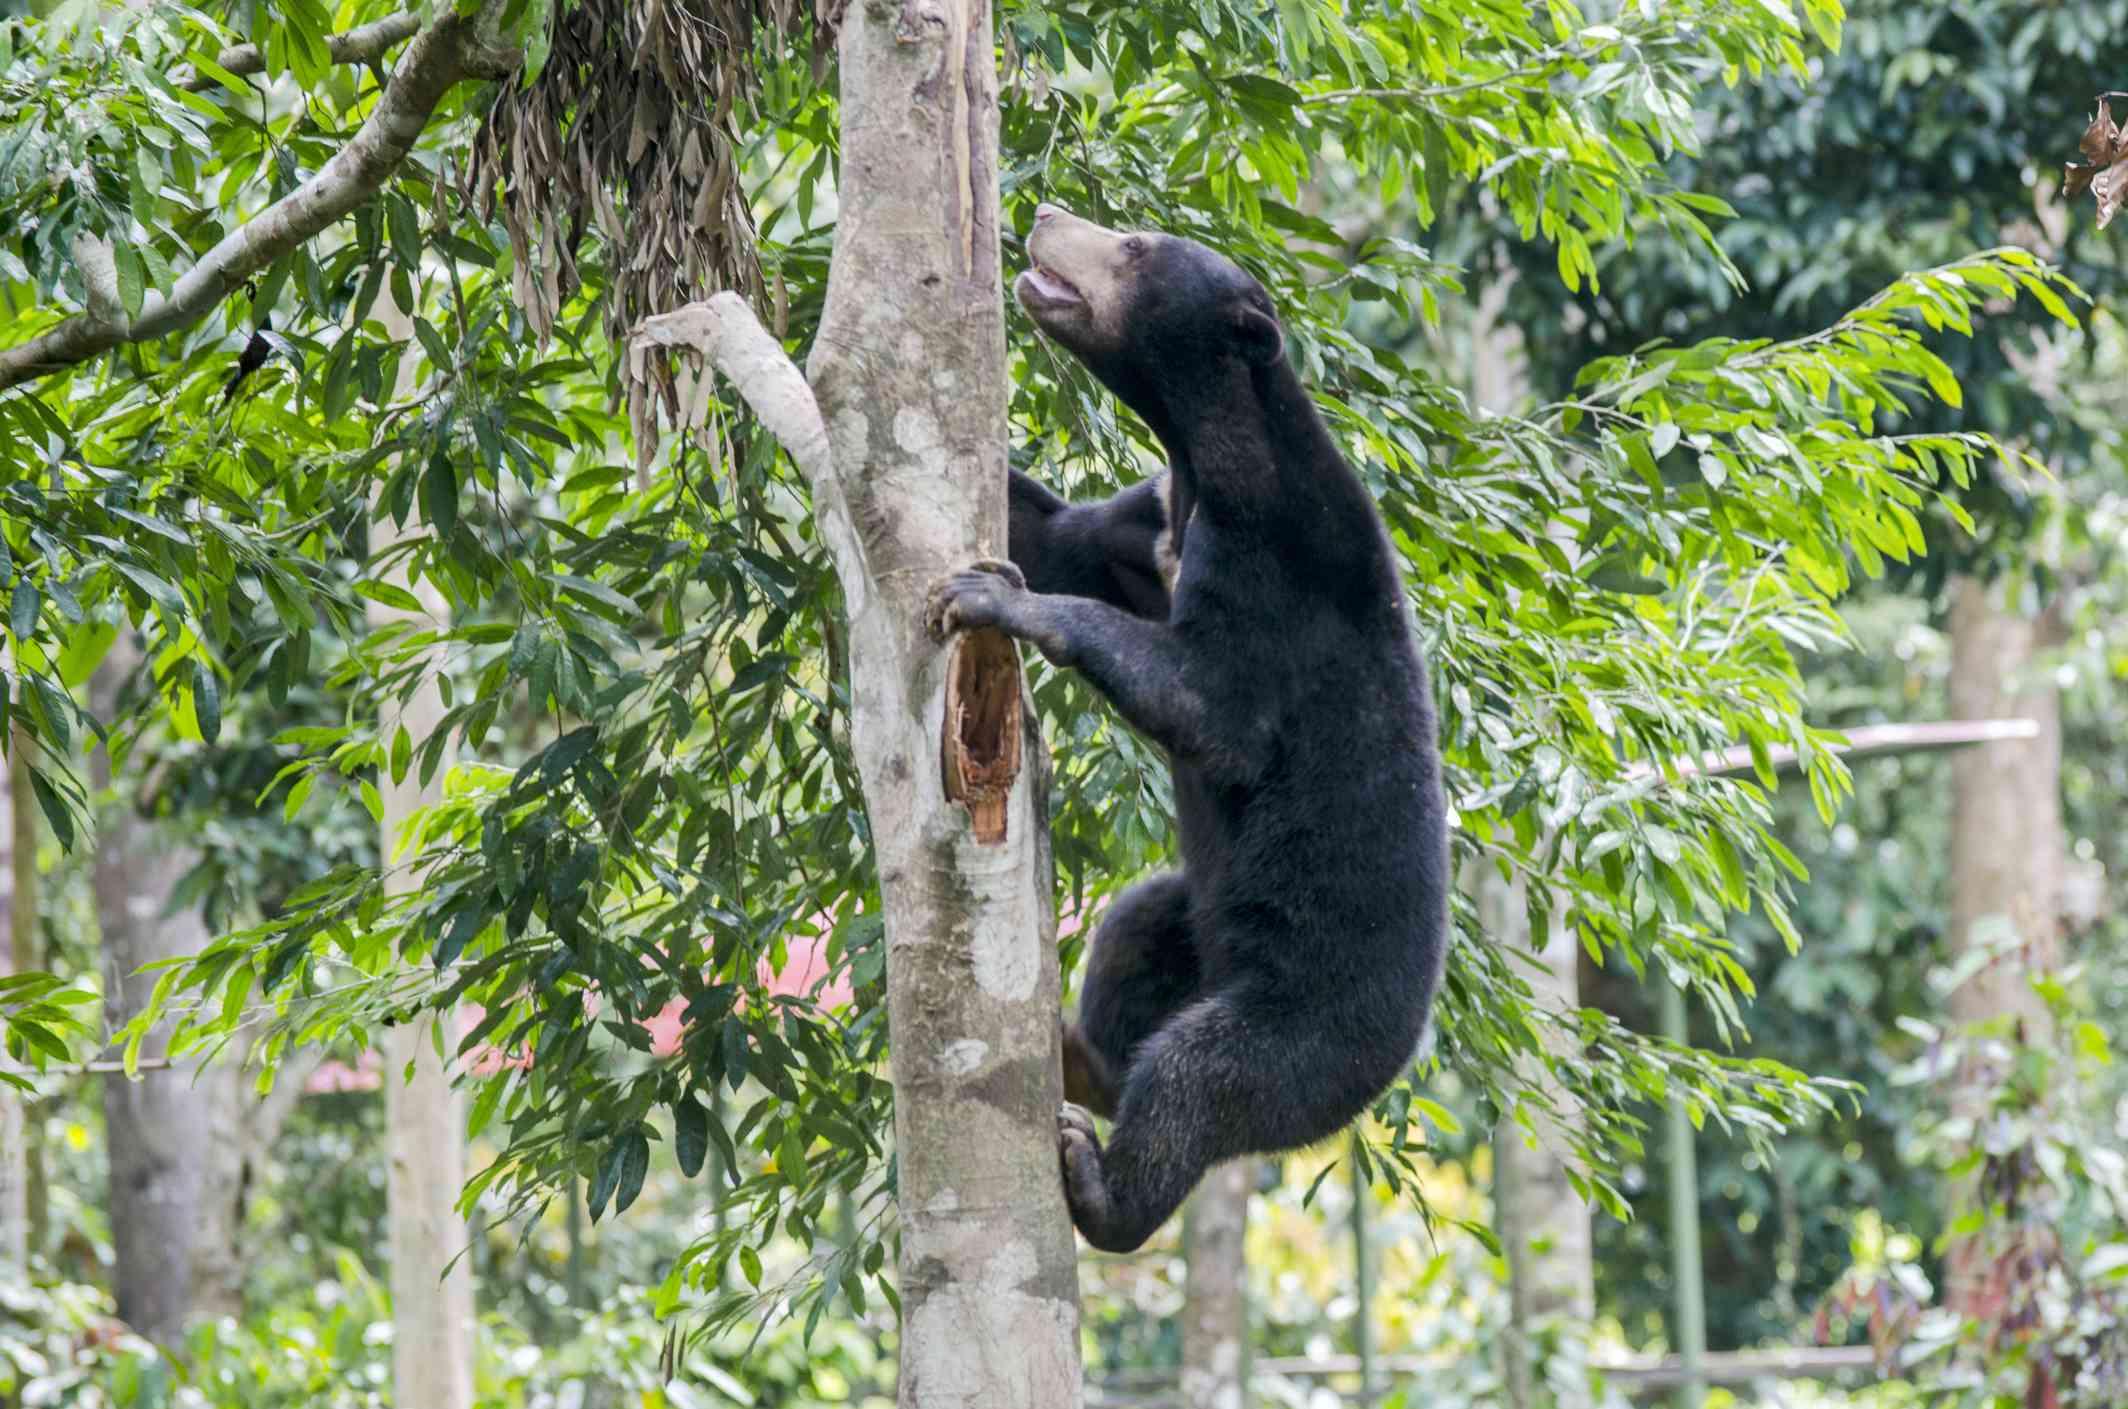 A brown sun bear climbing a tree in a green forest